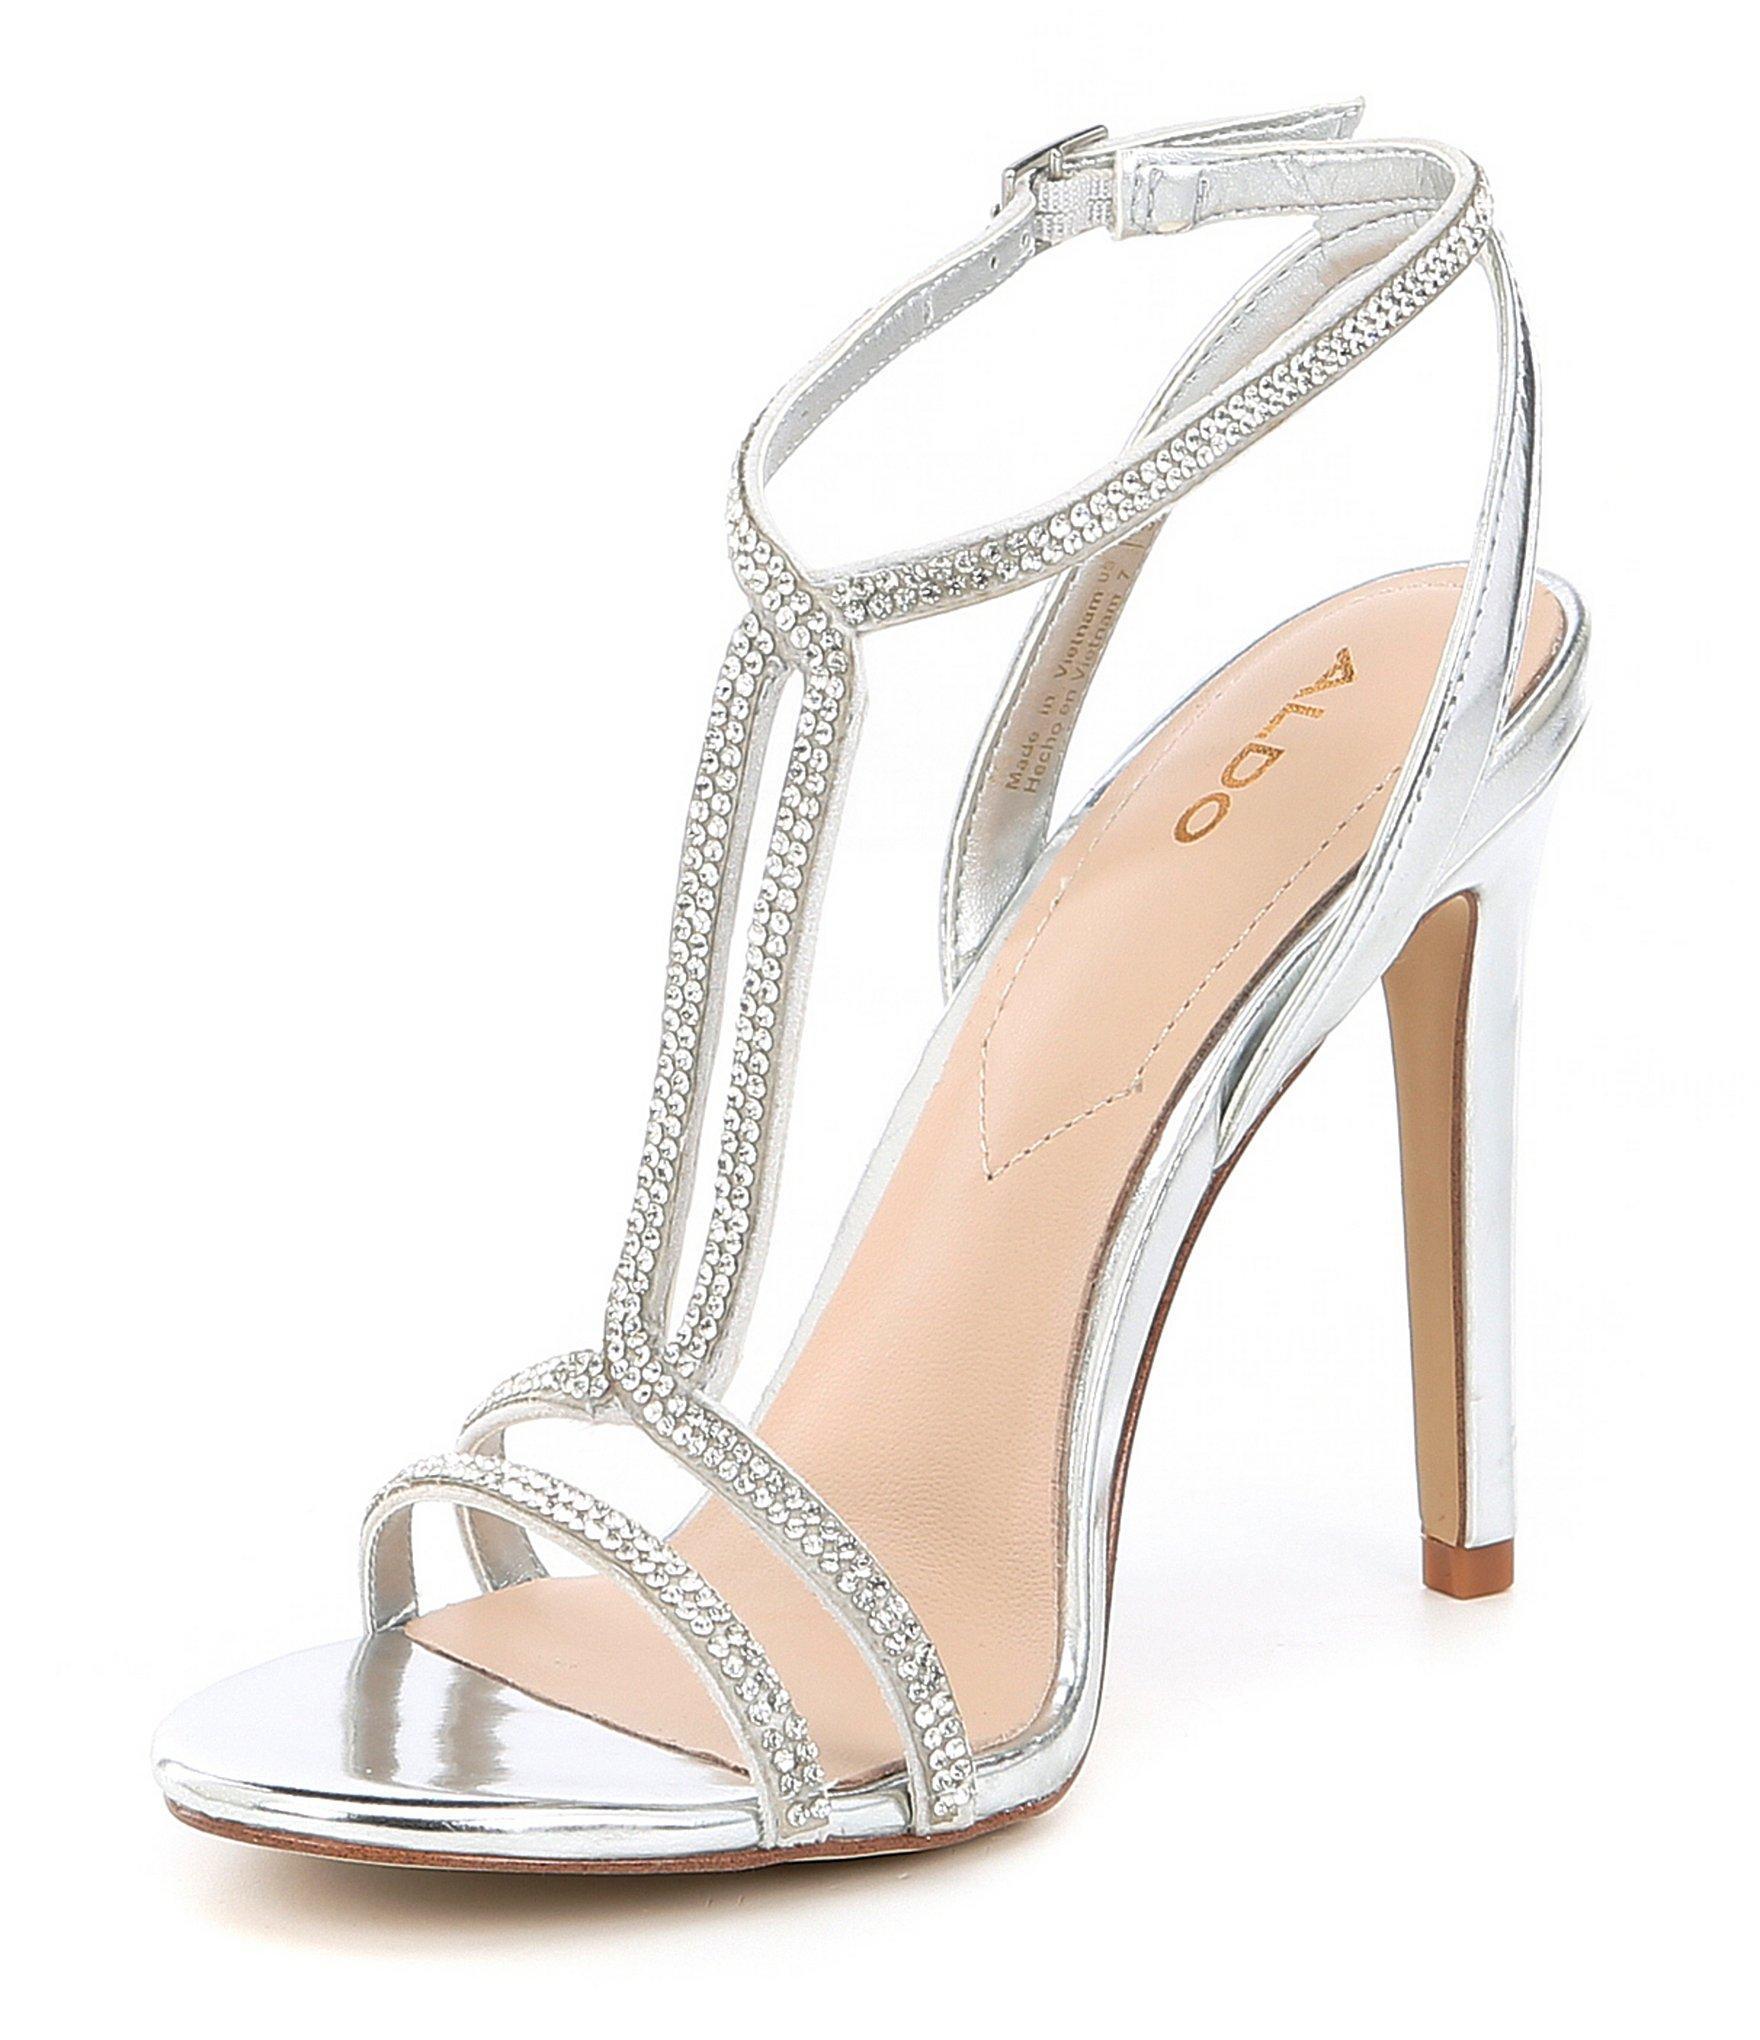 e88ff5f6306 Lyst - ALDO Dovyan Embellished Heeled Sandals In Silver in Metallic